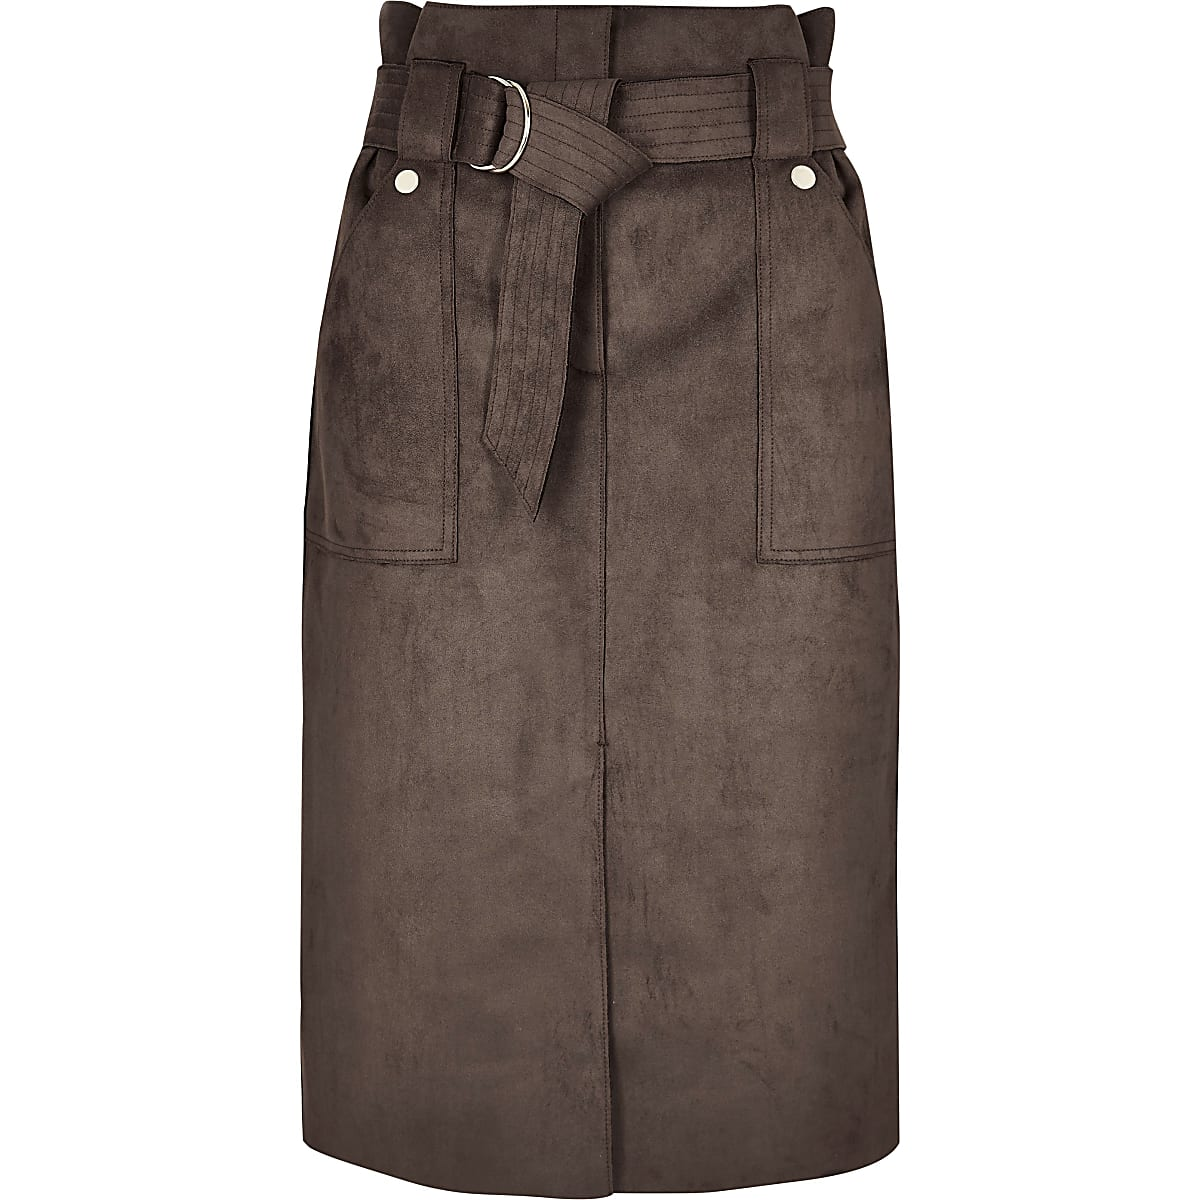 9cc8edbd5 River Island Denim Midi Skirt